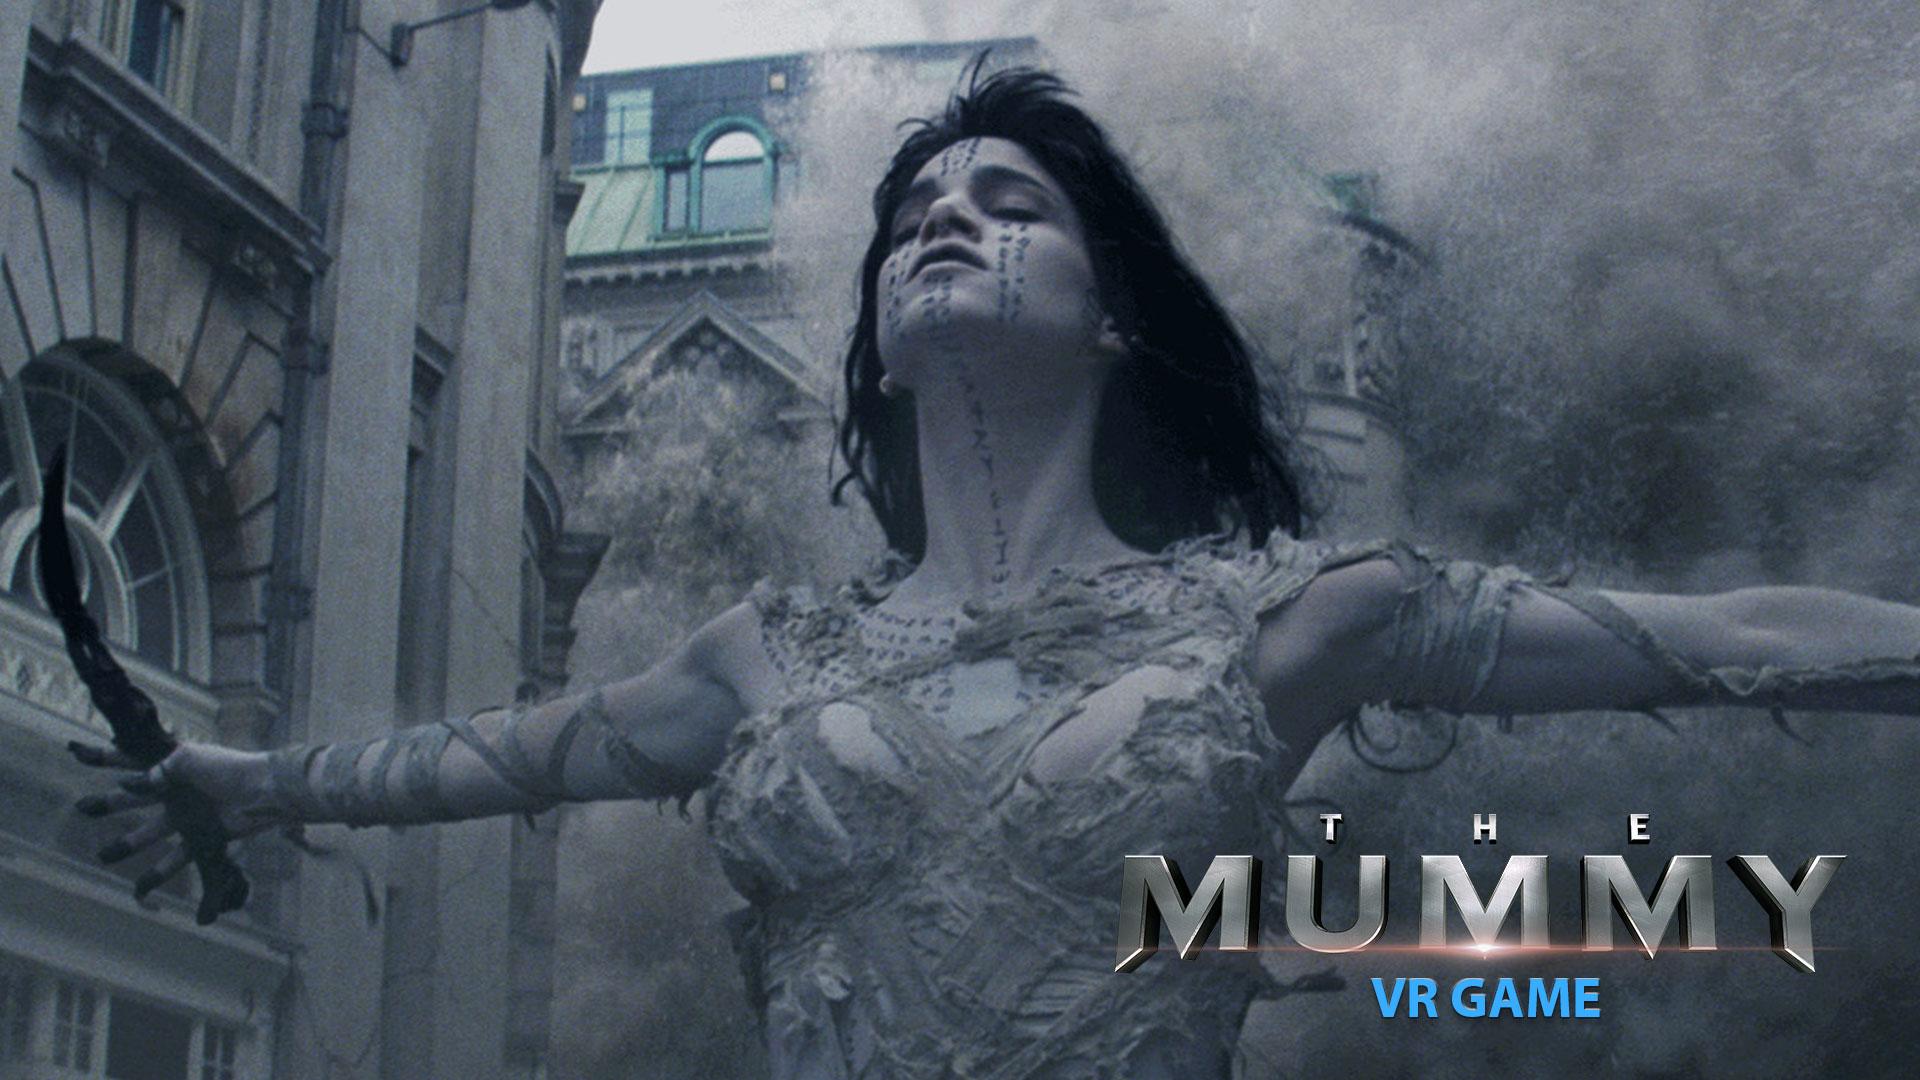 VV_The-mummy_banner.jpg